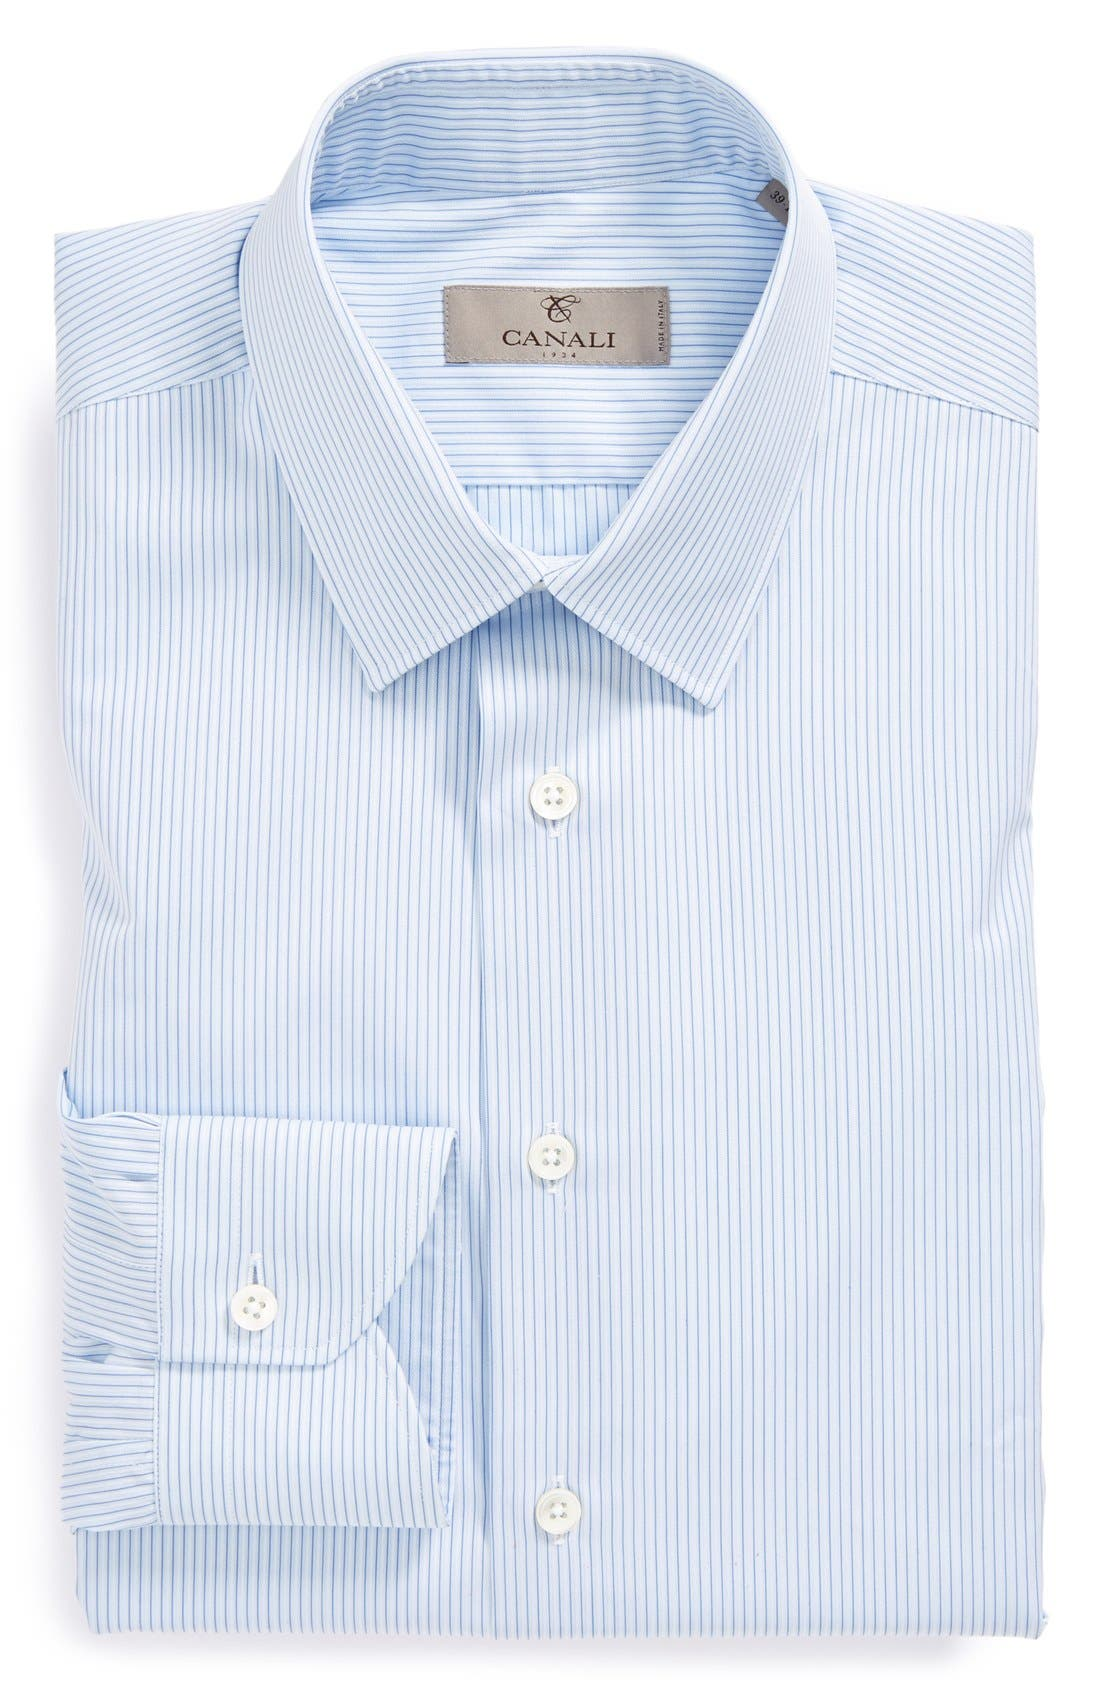 Alternate Image 1 Selected - Canali Regular Fit Stripe Dress Shirt